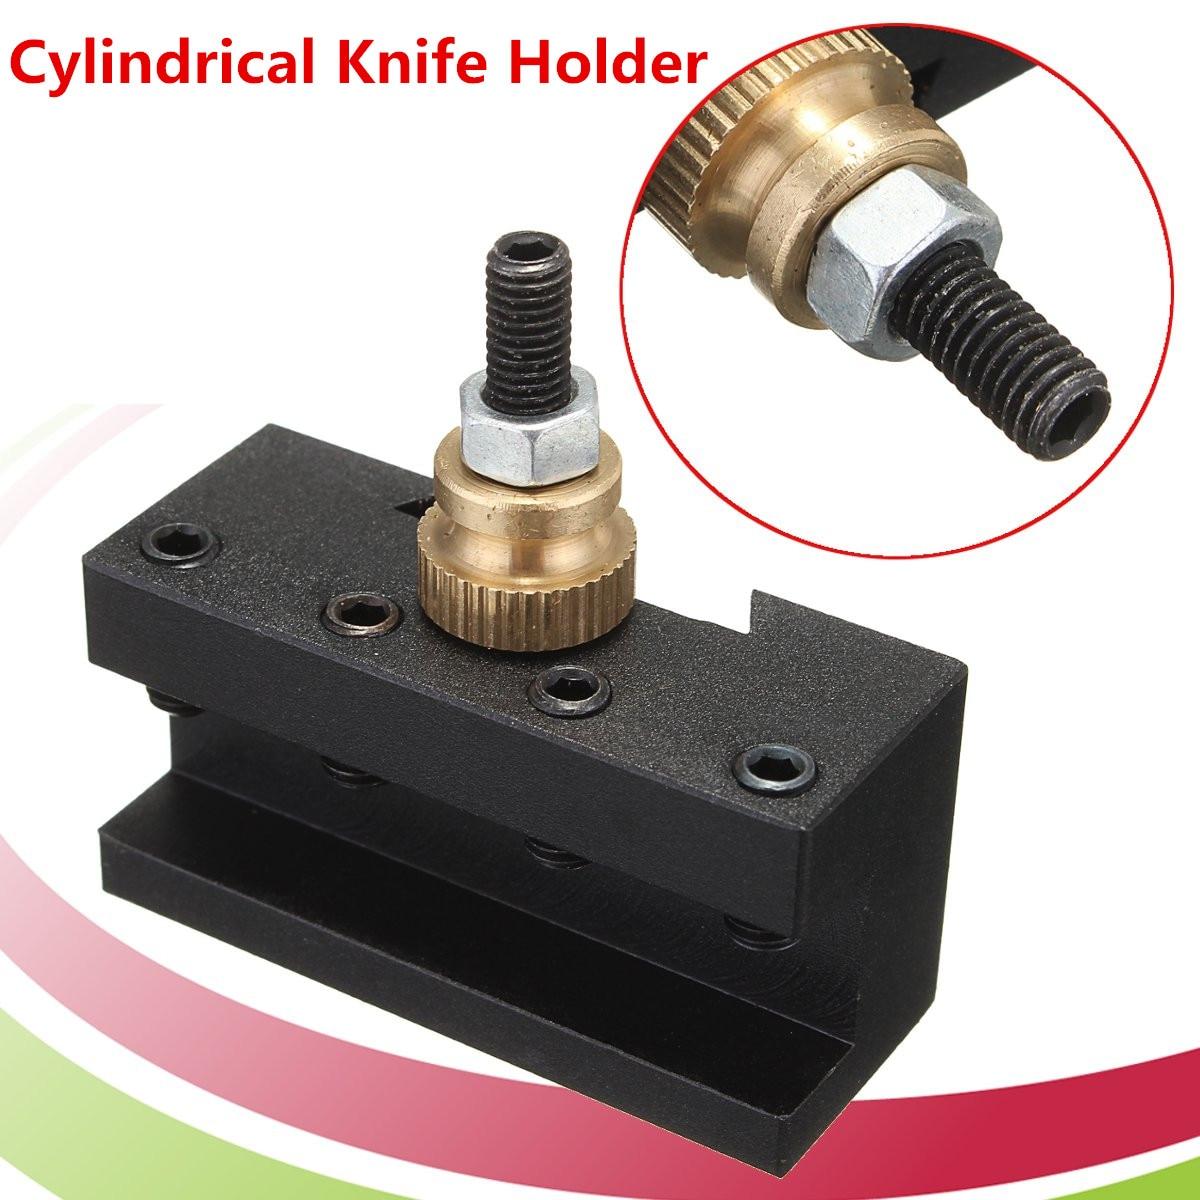 1//4-1//2 Lathe Quick Change Post Facing Milling Turning Tools Holder Set Kit